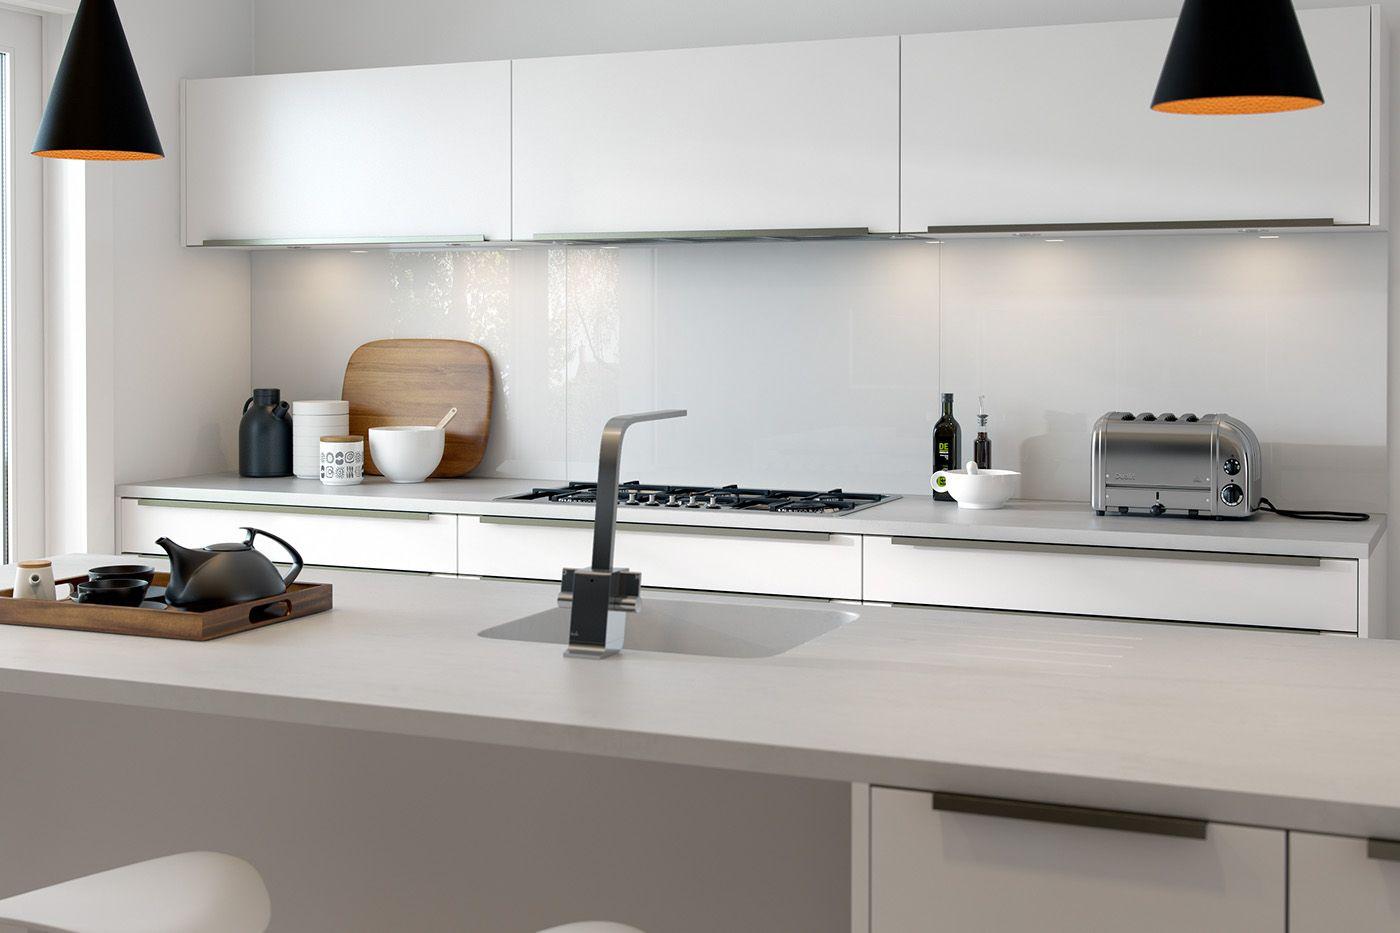 Cgi Room Set Photography For German Kitchen Manufacturer Galley Kitchen Kitchen Manufacturers Kitchen